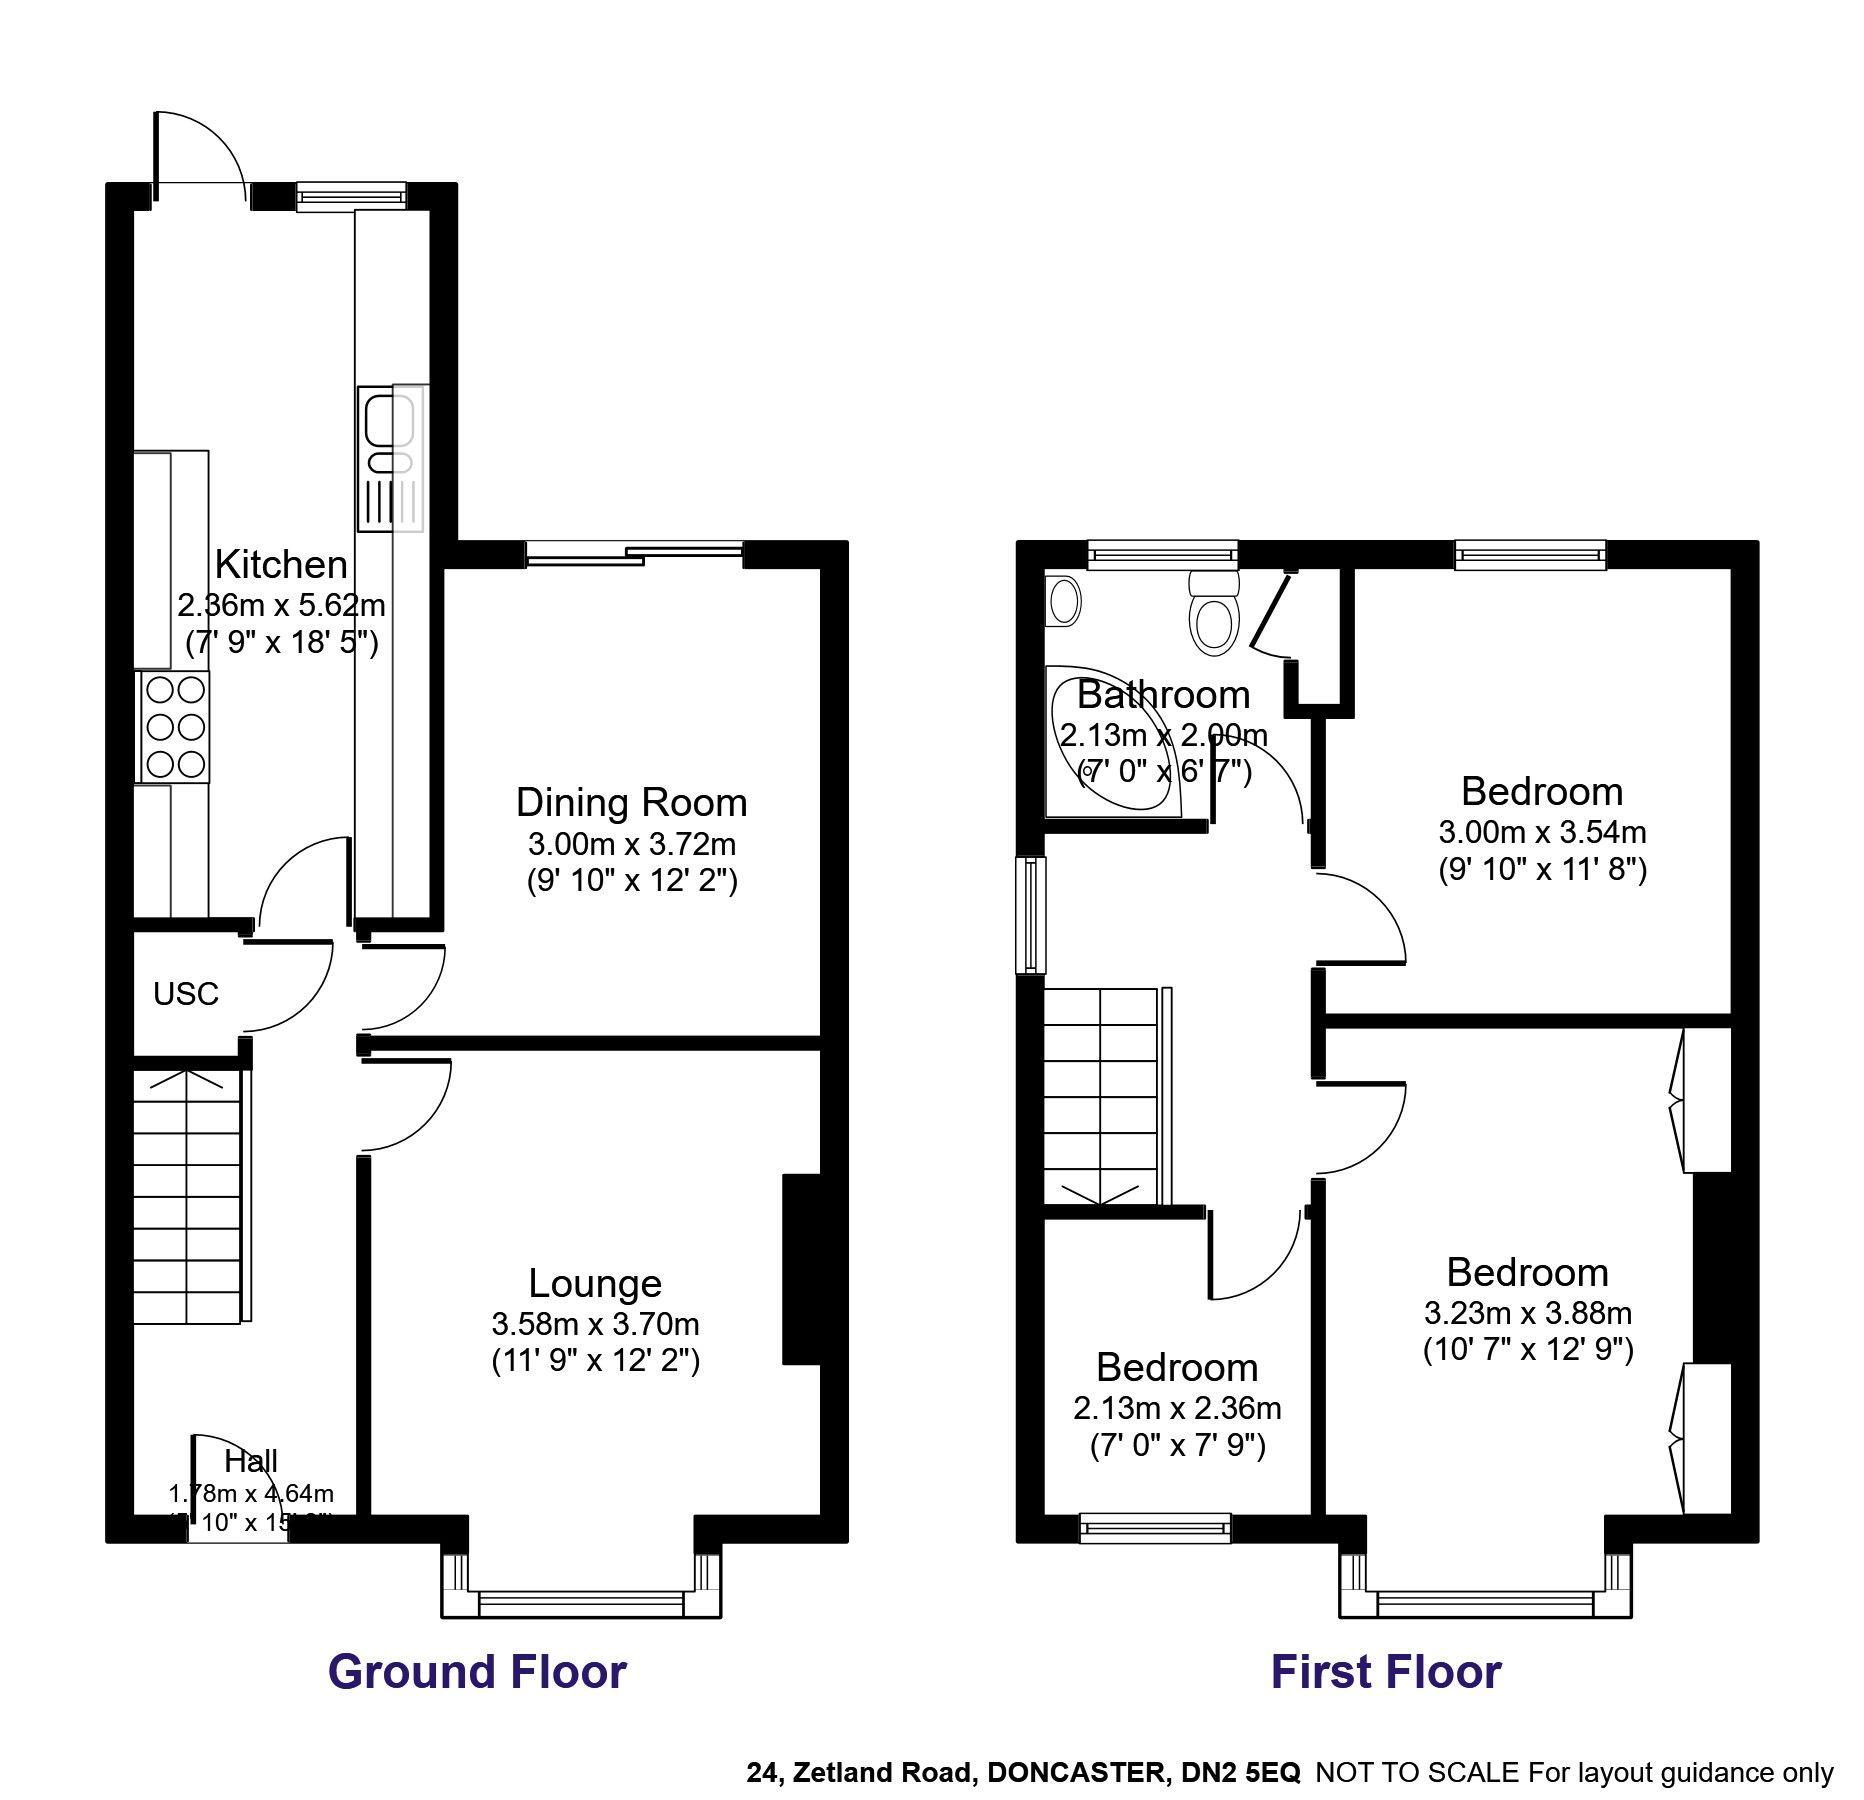 To Let - 3 bedroom Semi-detached house, Zetland Road, Doncaster - £750 pcm